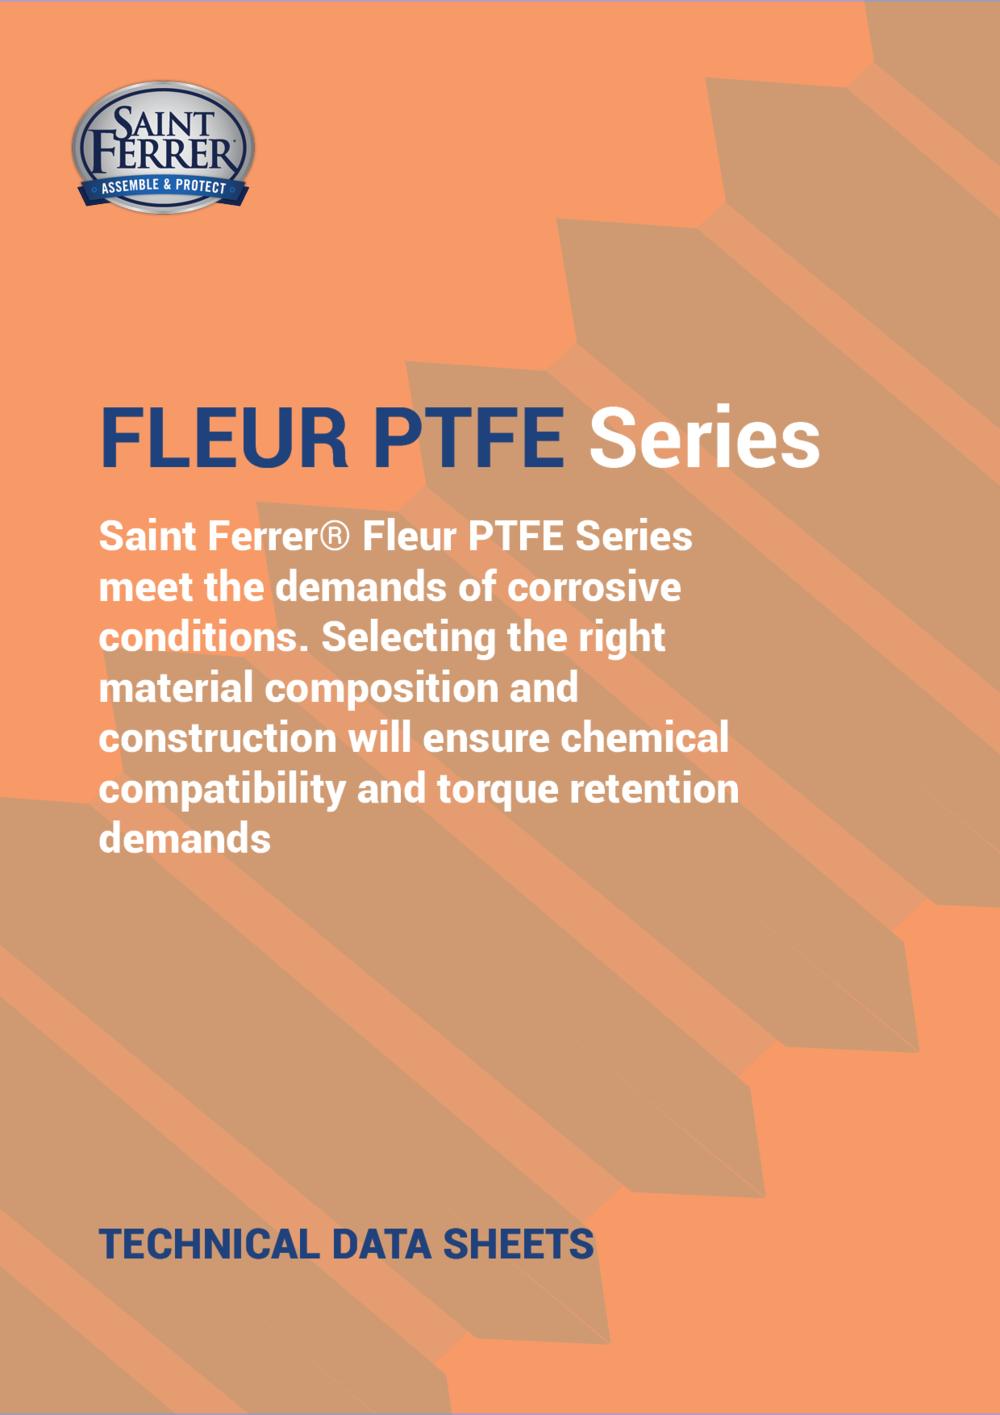 Fleur PTFE Series.png